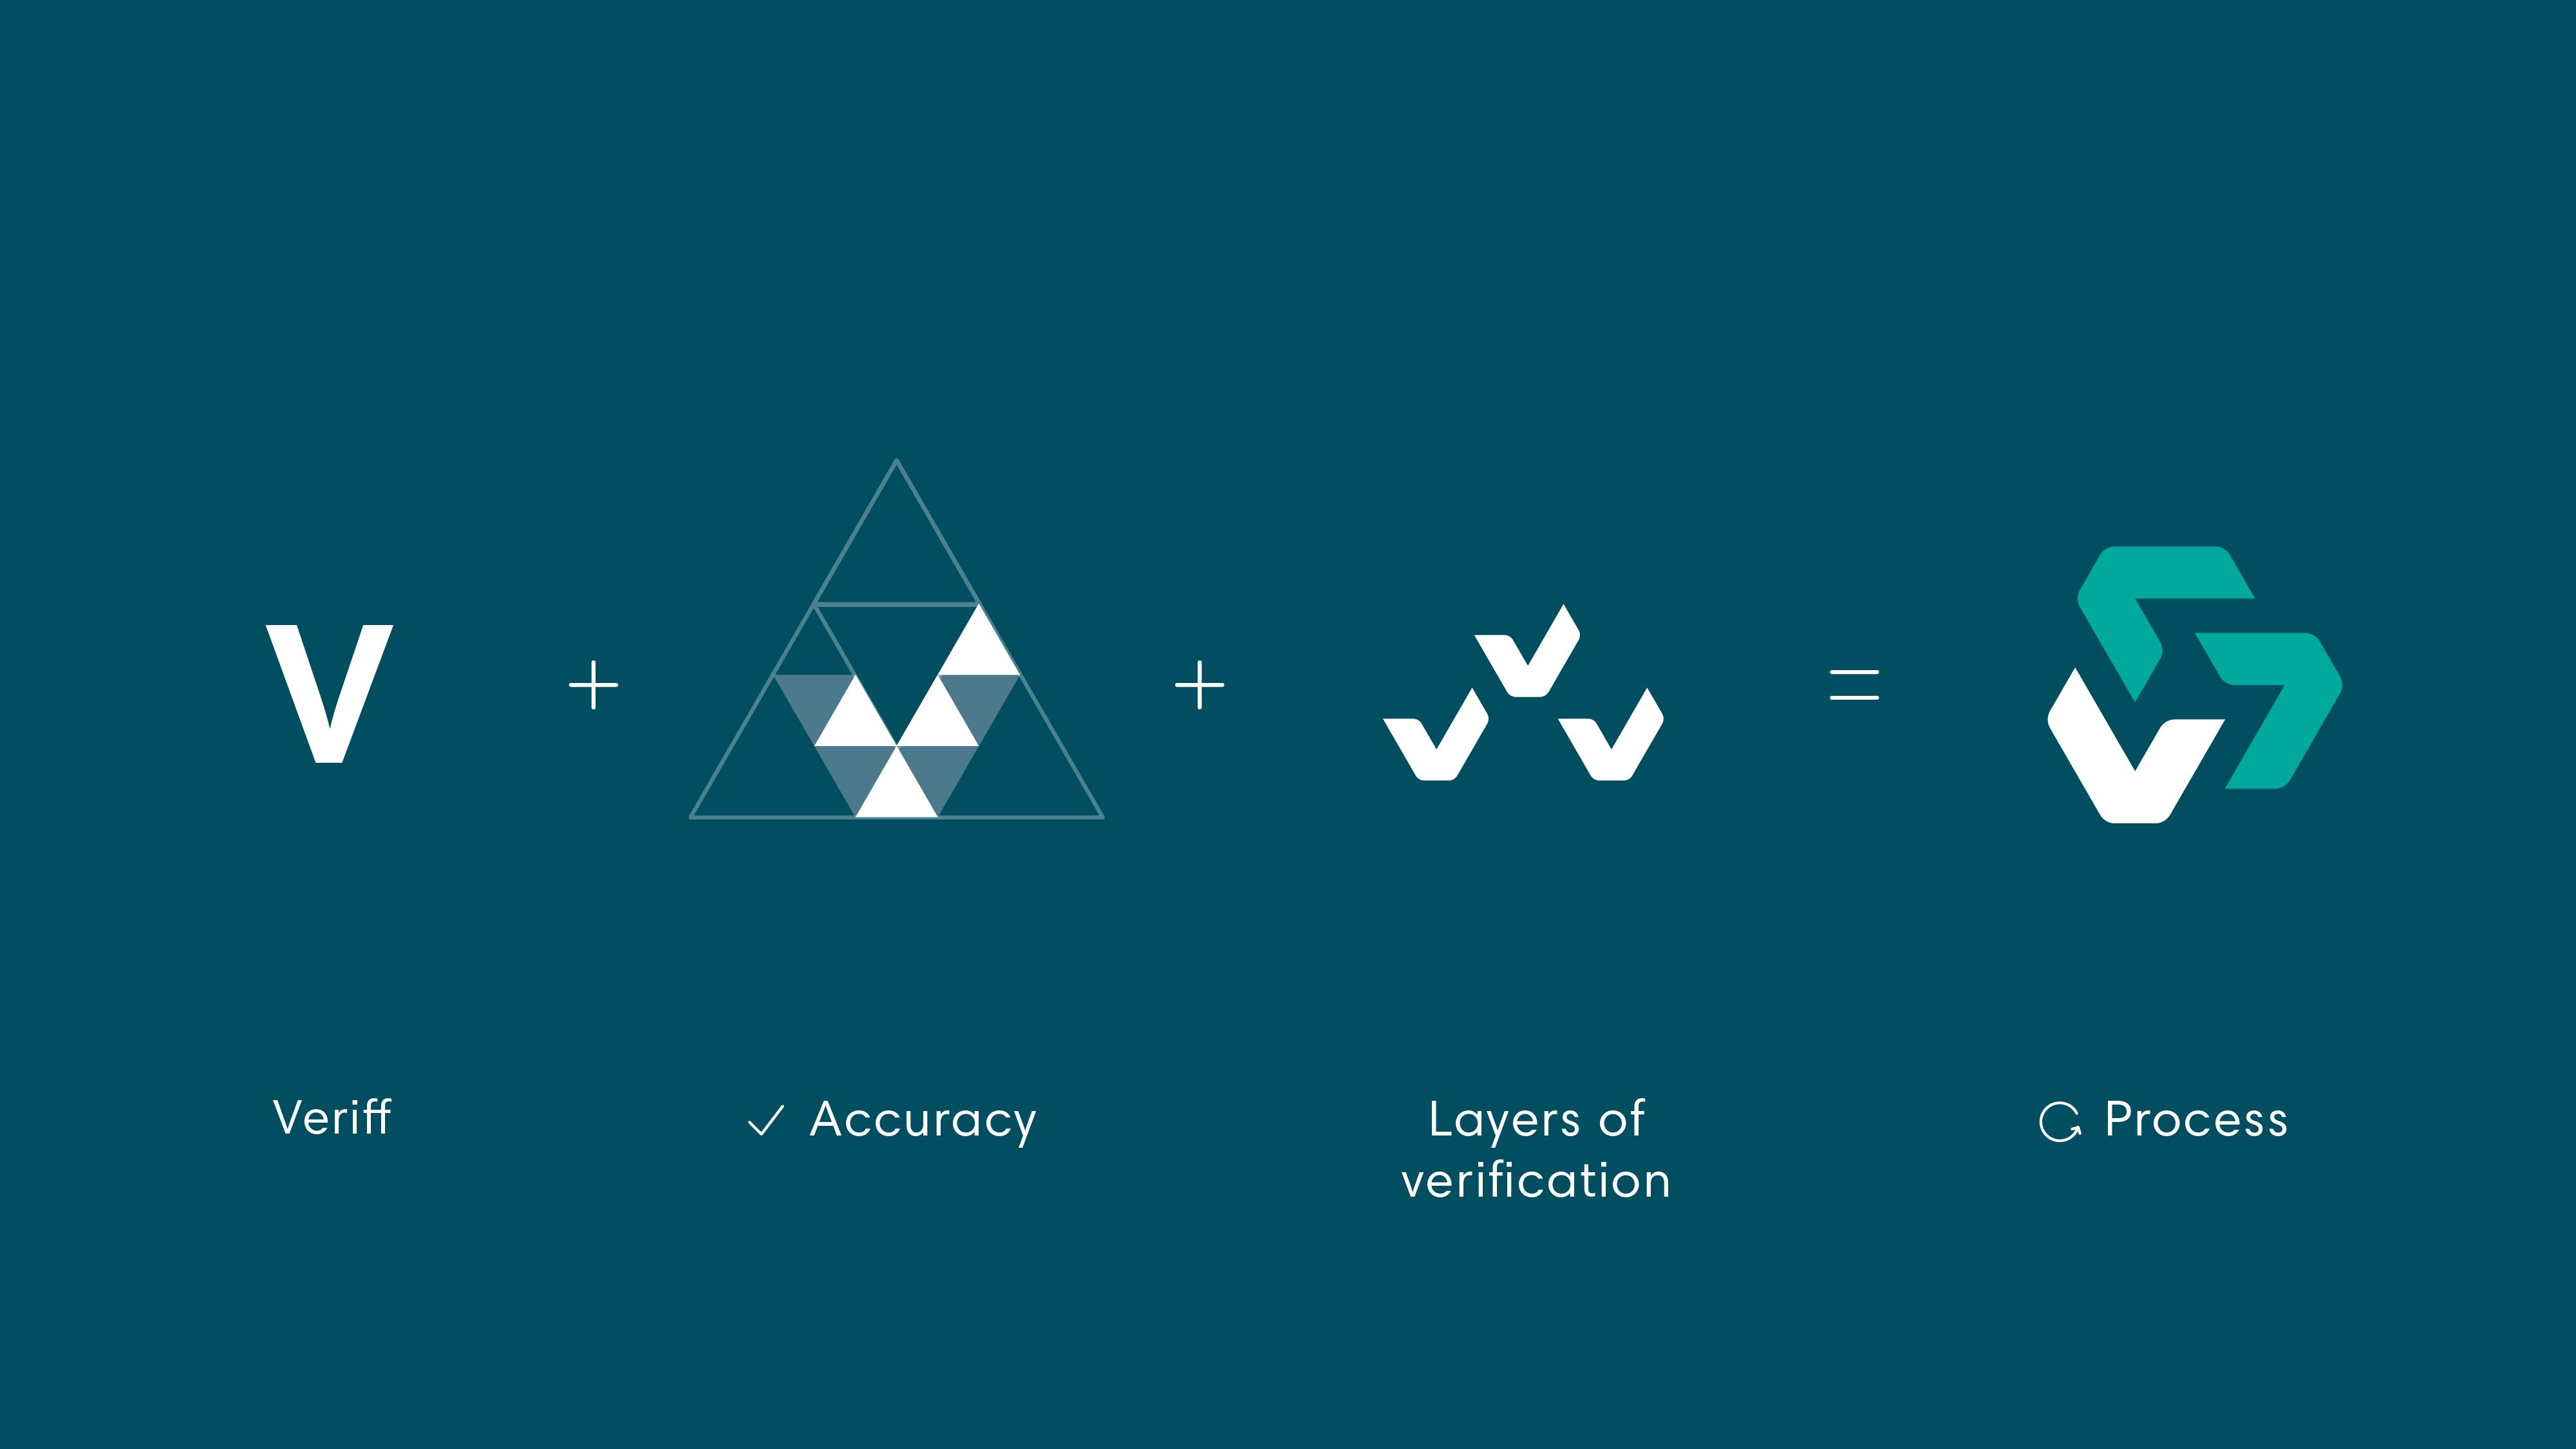 Veriff logo is based on the identity verification process